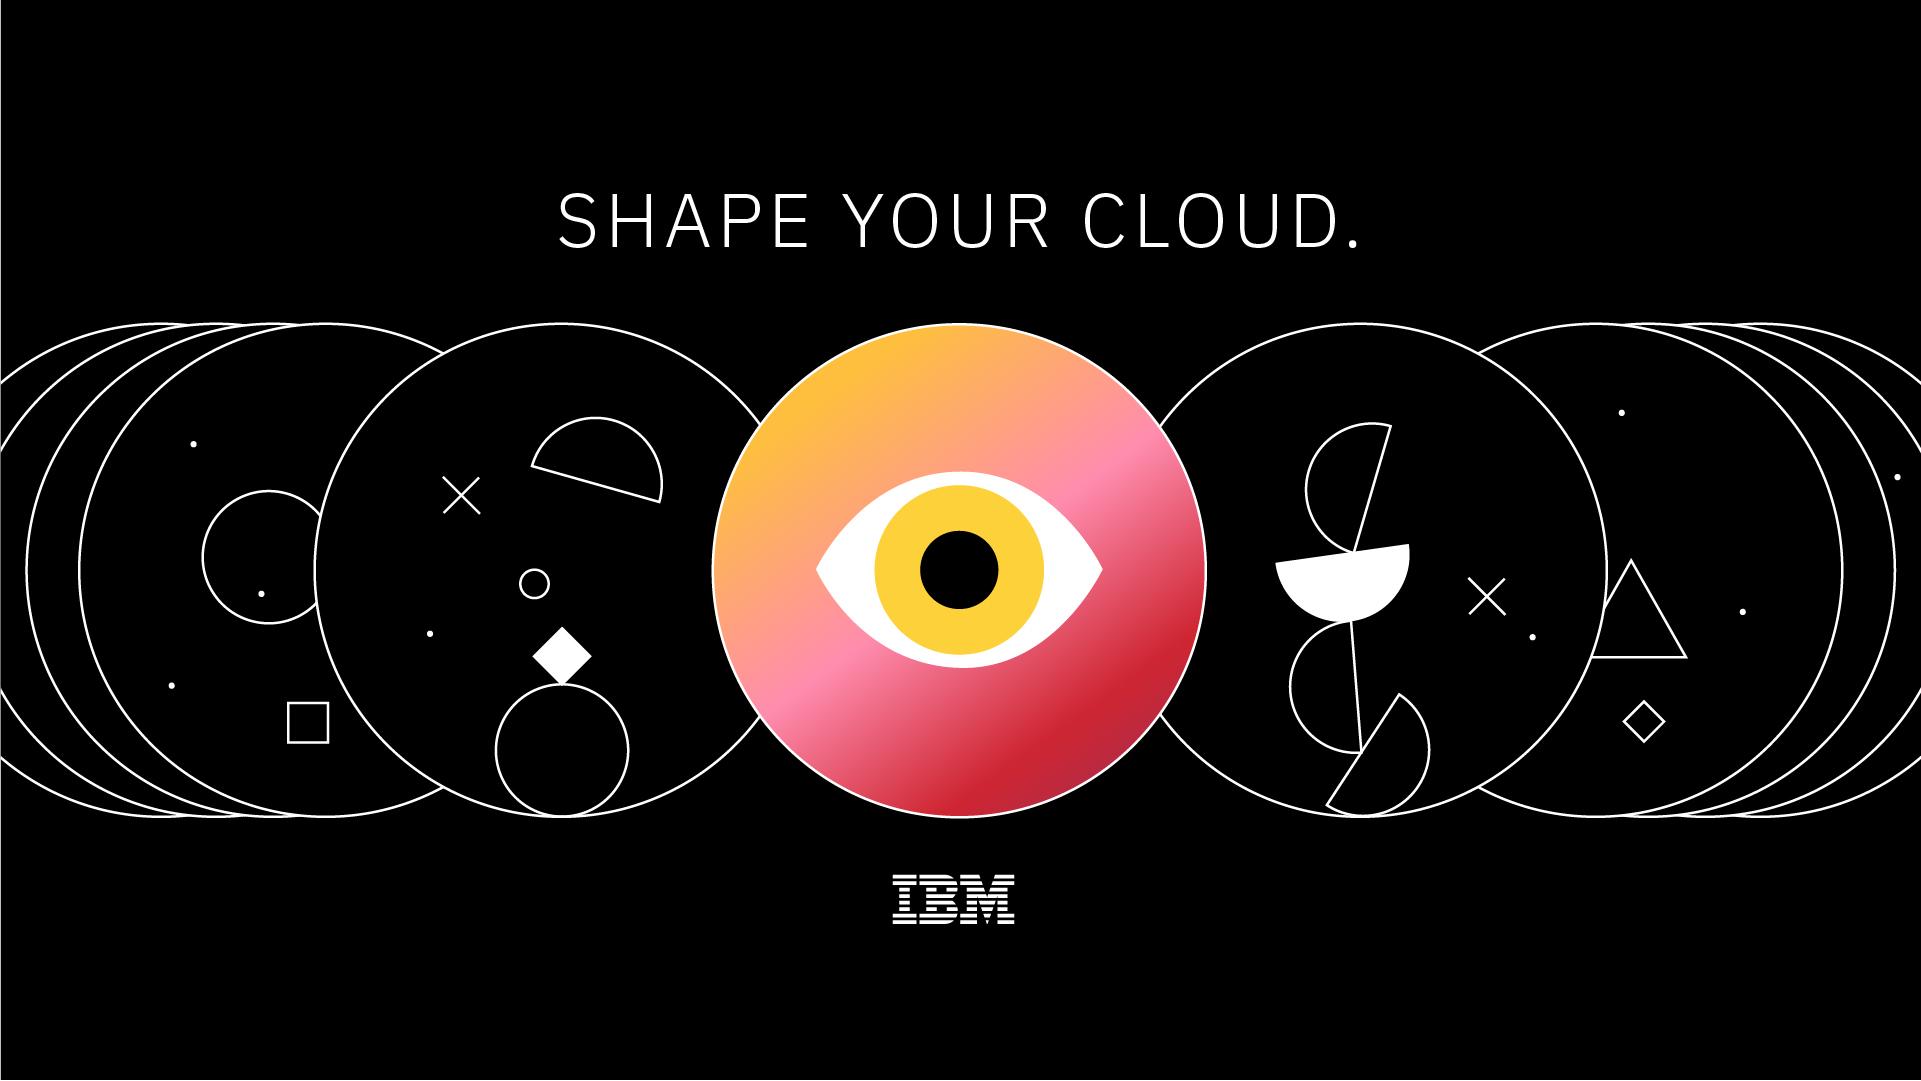 IBM_SHAPE-YOUR-CLOUD_DC_EDITS_BH_proceso_IBM-process-12.jpg